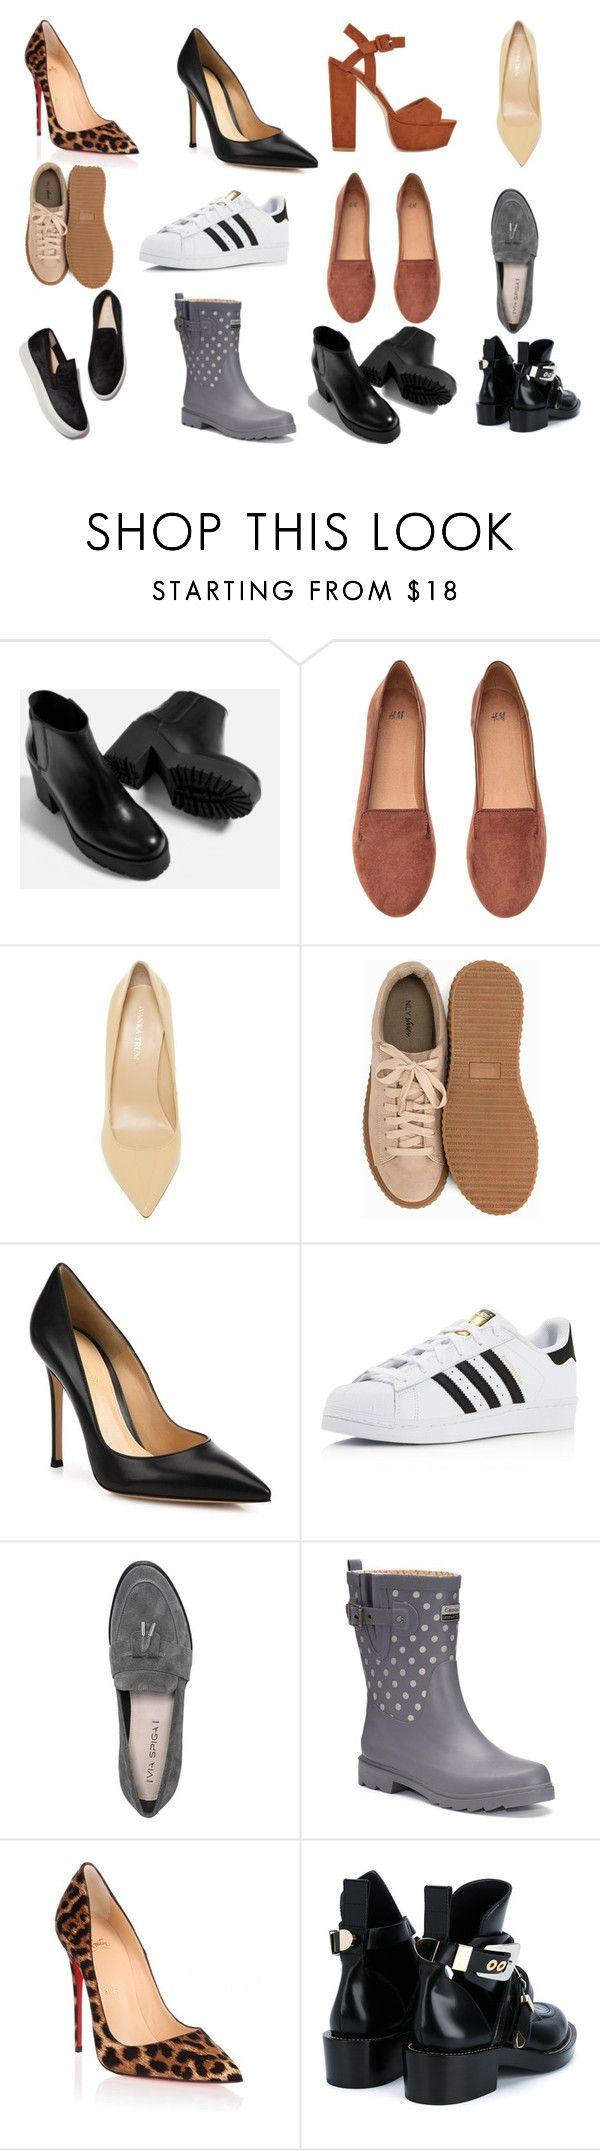 """база обувь"" by solnce1109 on Polyvore featuring мода, Piel Leather, H&M, Ivanka Trump, Nly Shoes, Gianvito Rossi, adidas, Via Spiga, Chooka и Christian Louboutin"